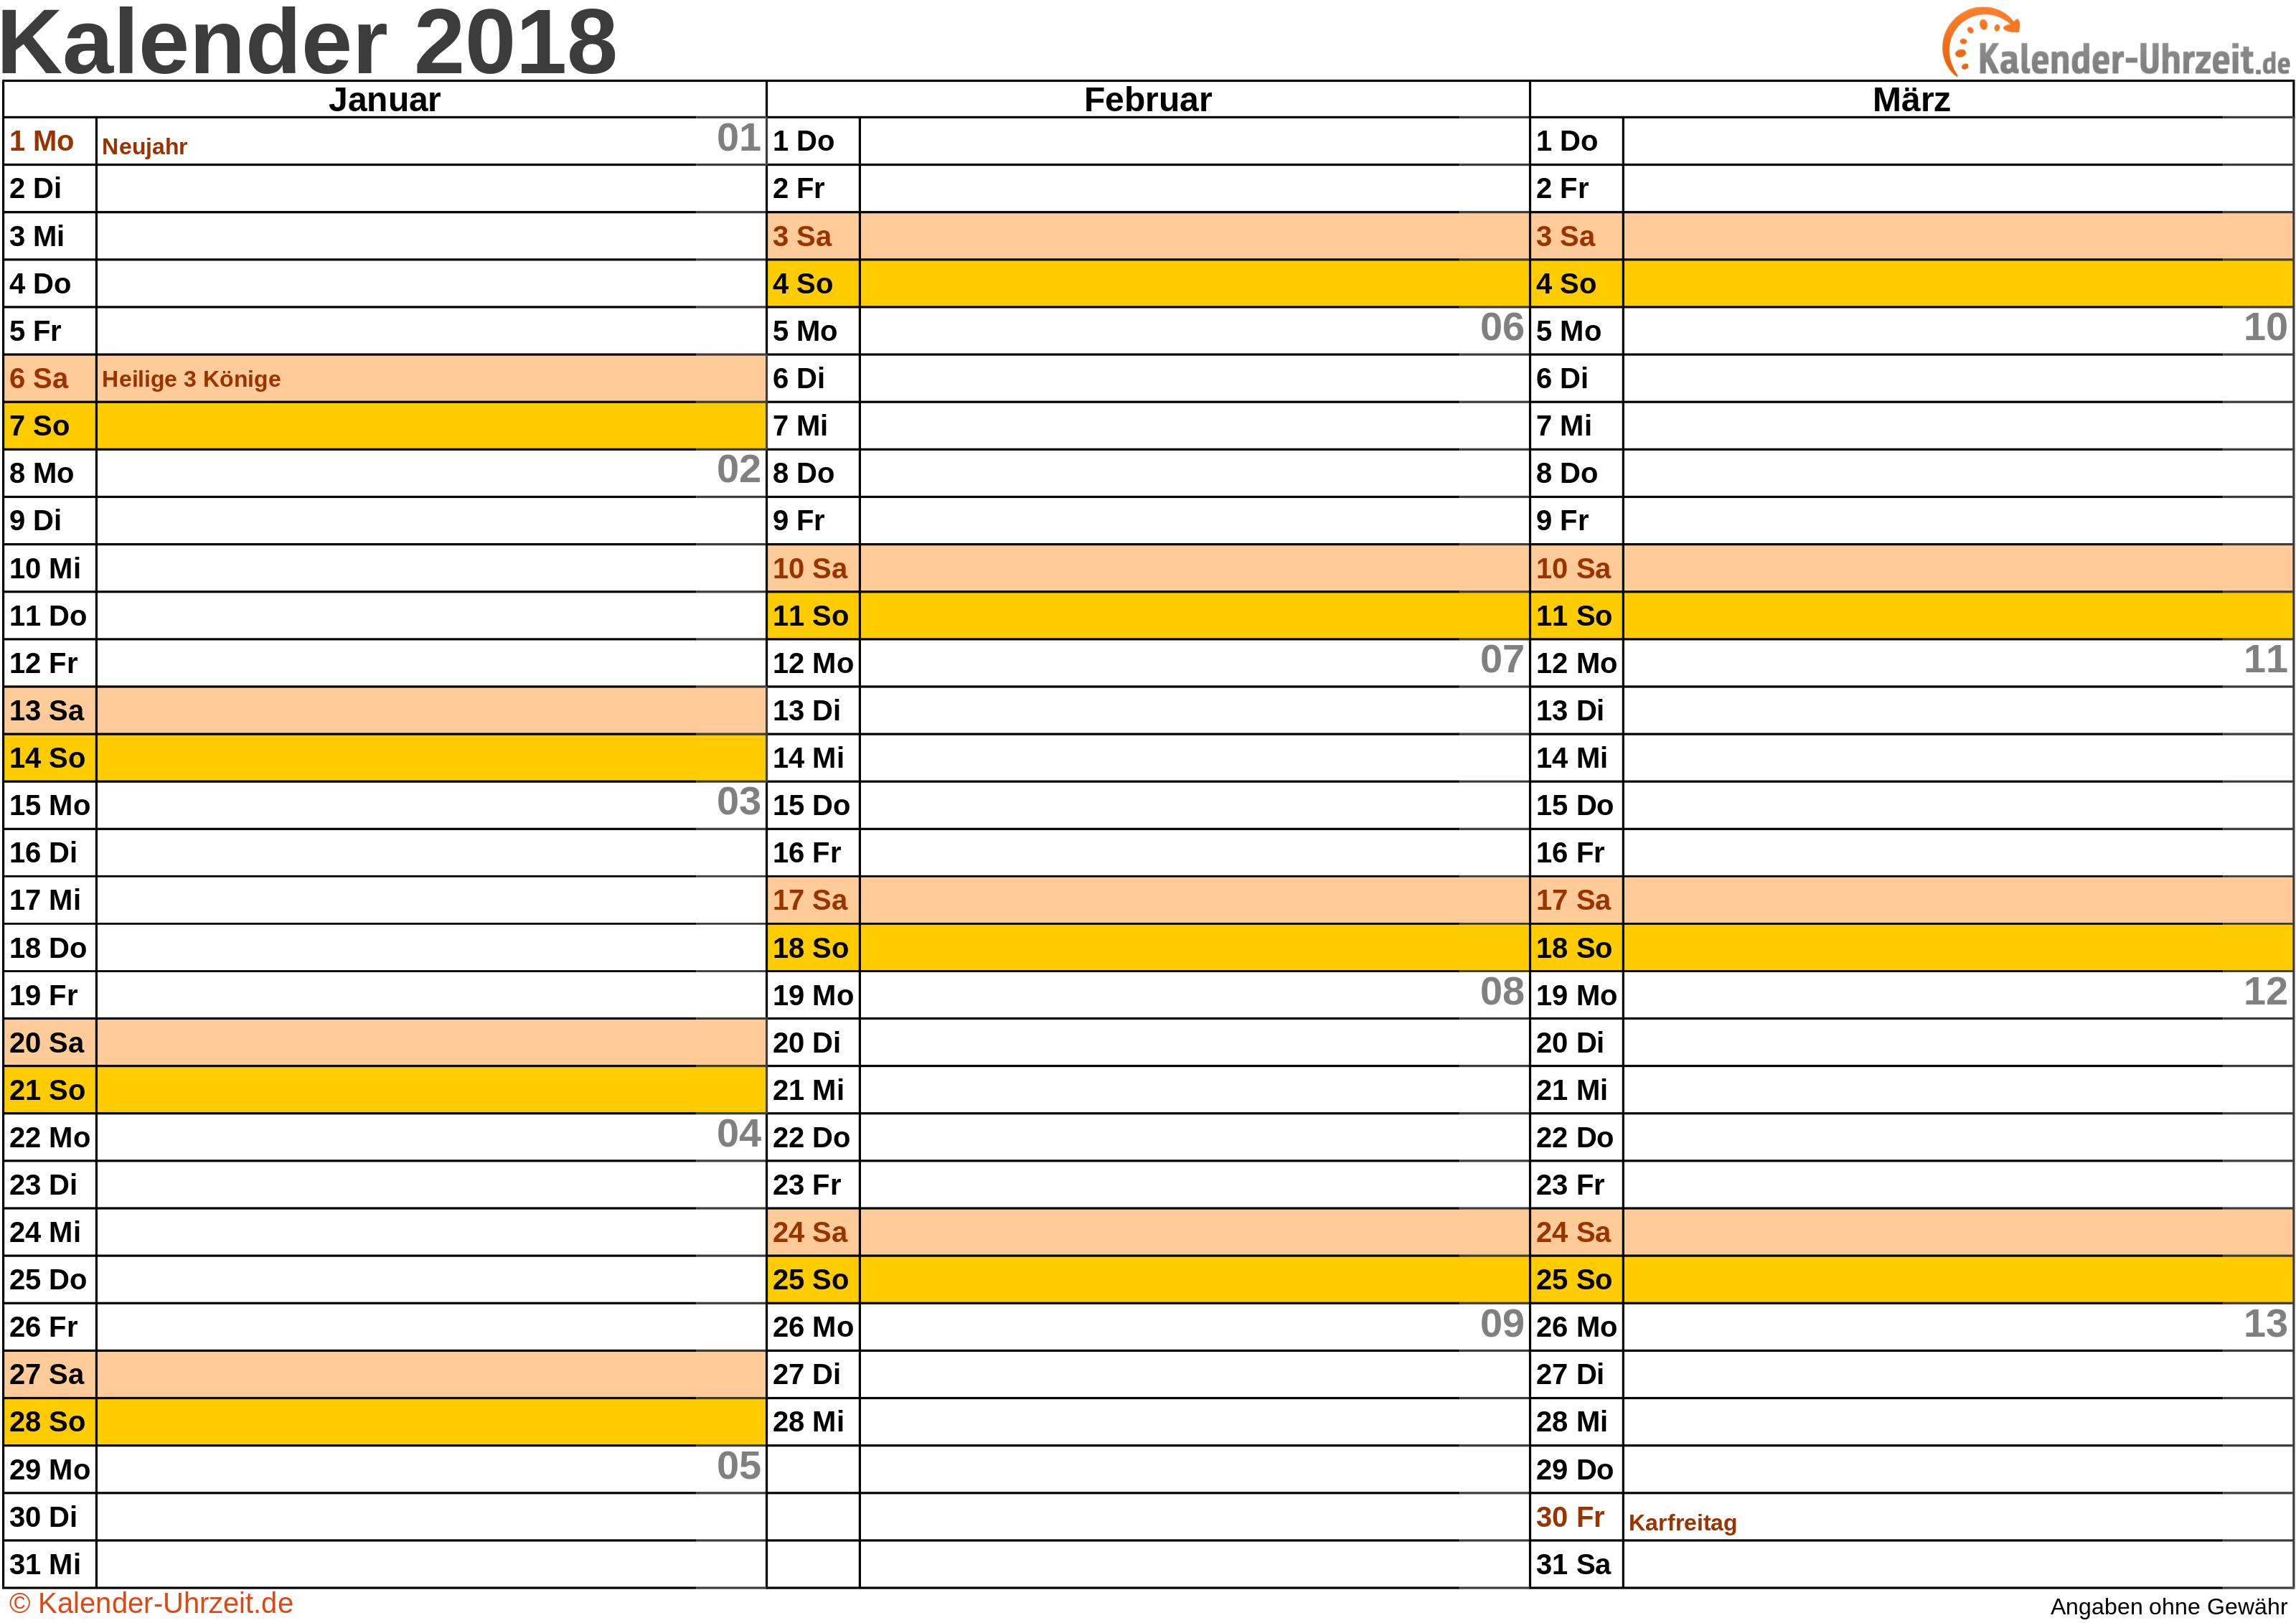 EXCEL-KALENDER 2018 - KOSTENLOS